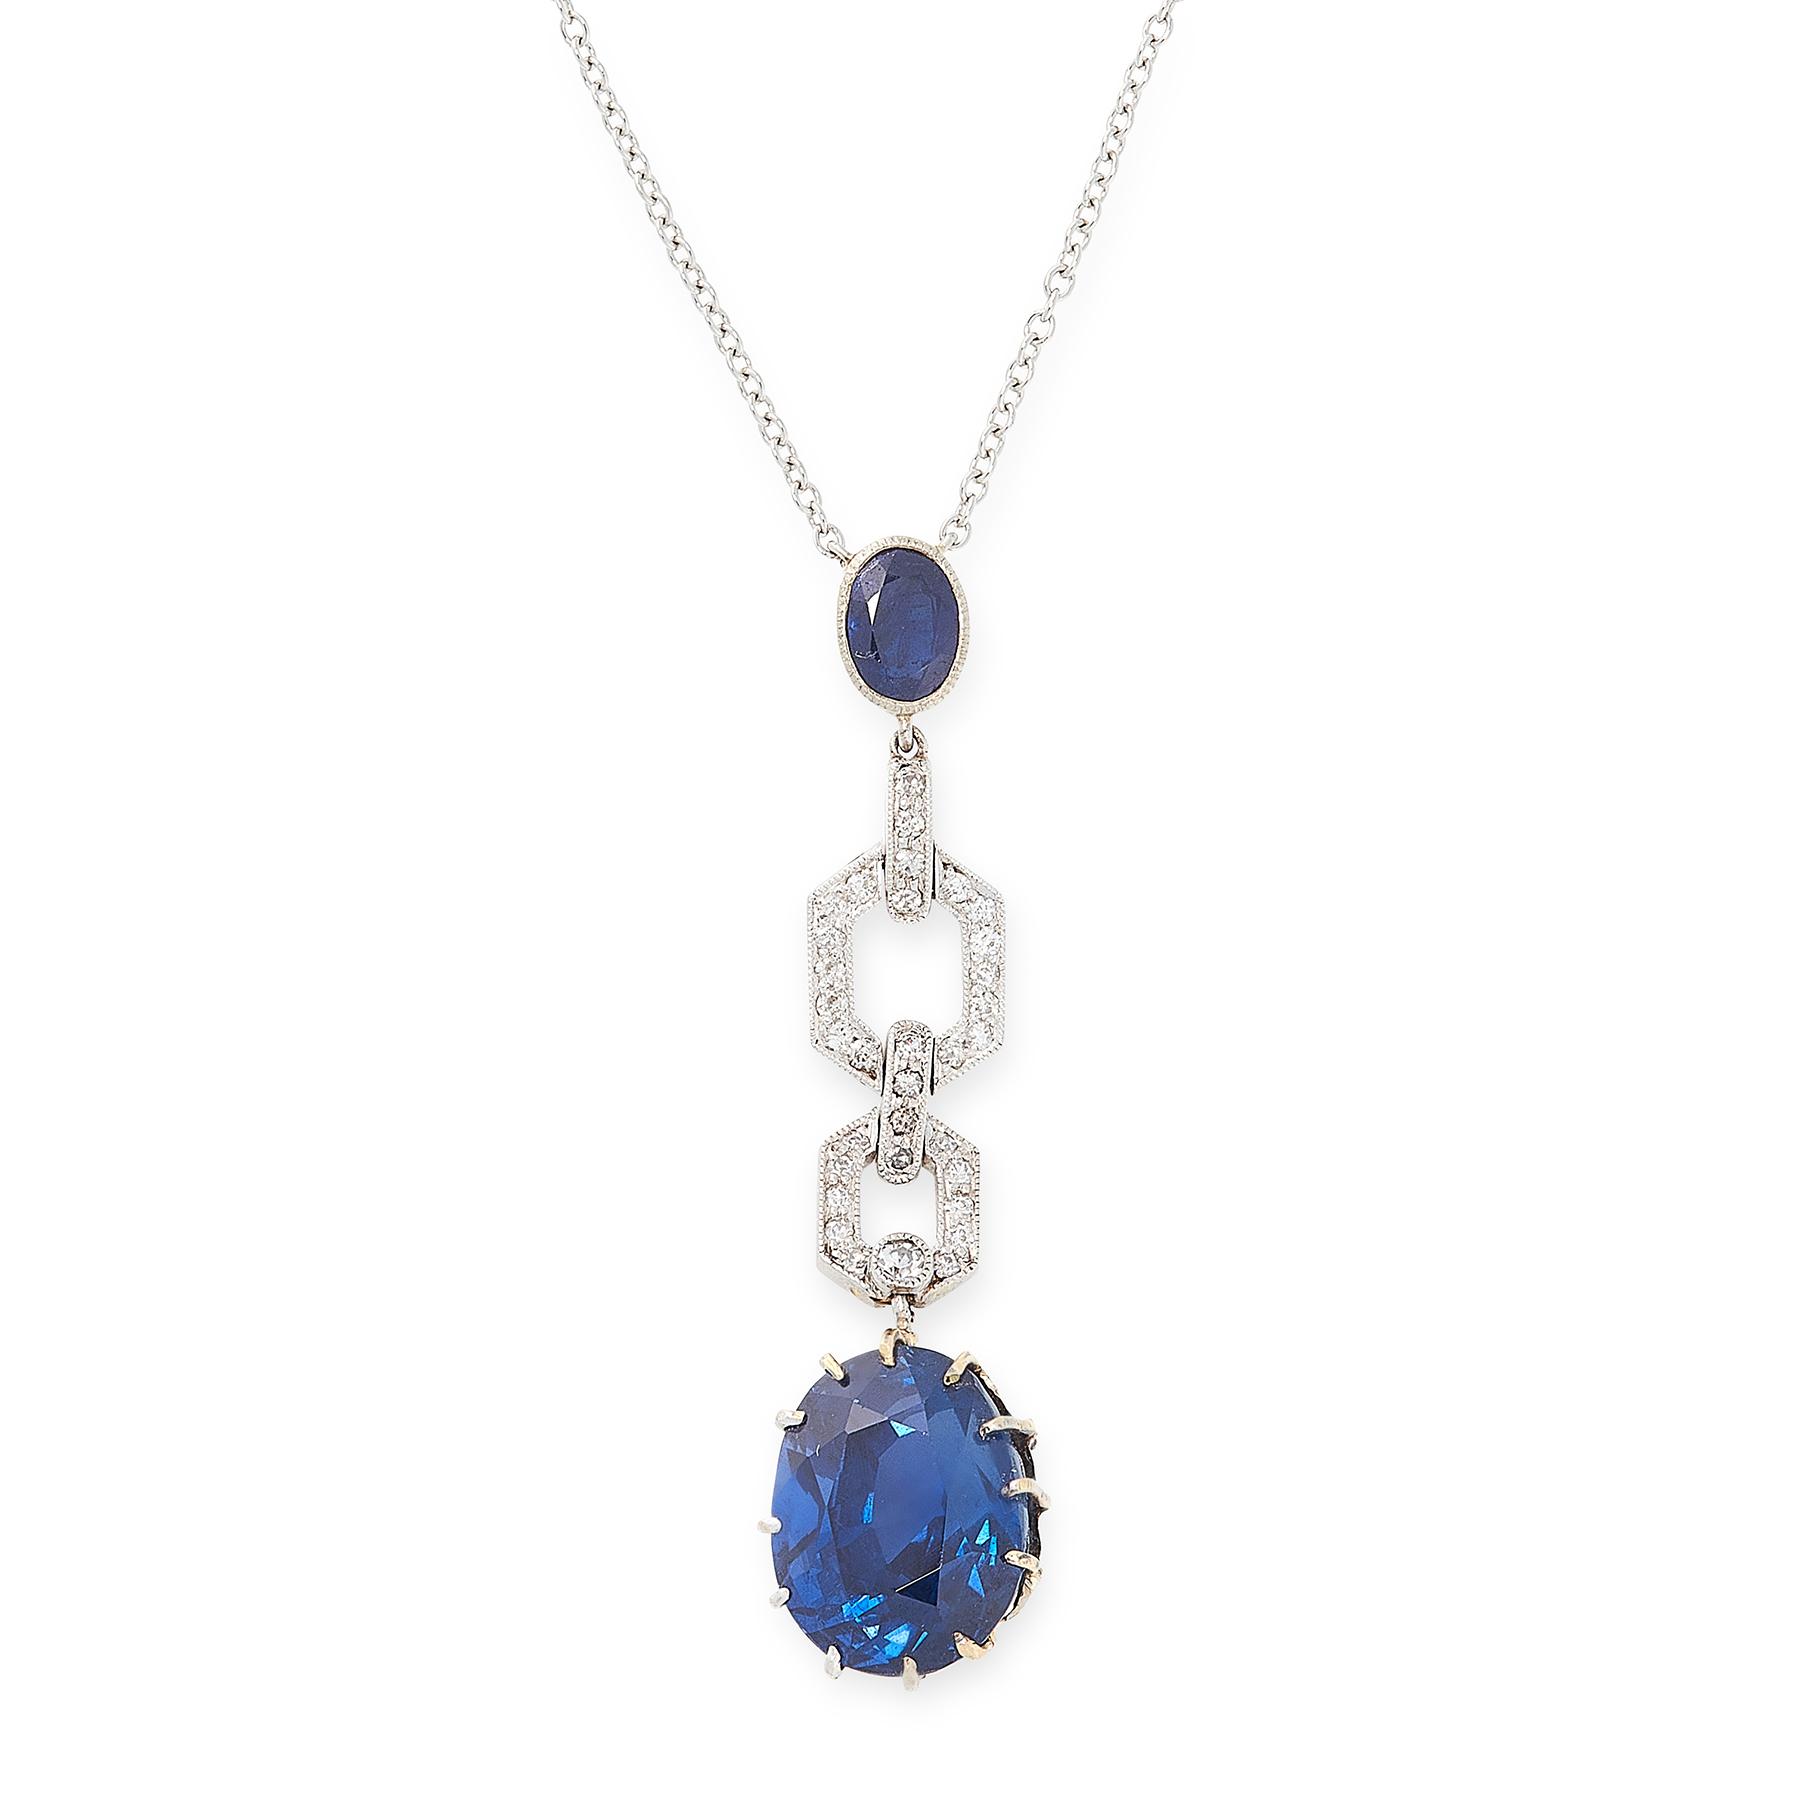 Lot 41 - A CEYLON NO HEAT SAPPHIRE AND DIAMOND PENDANT NECKLACE set with a principal oval cut blue sapphire